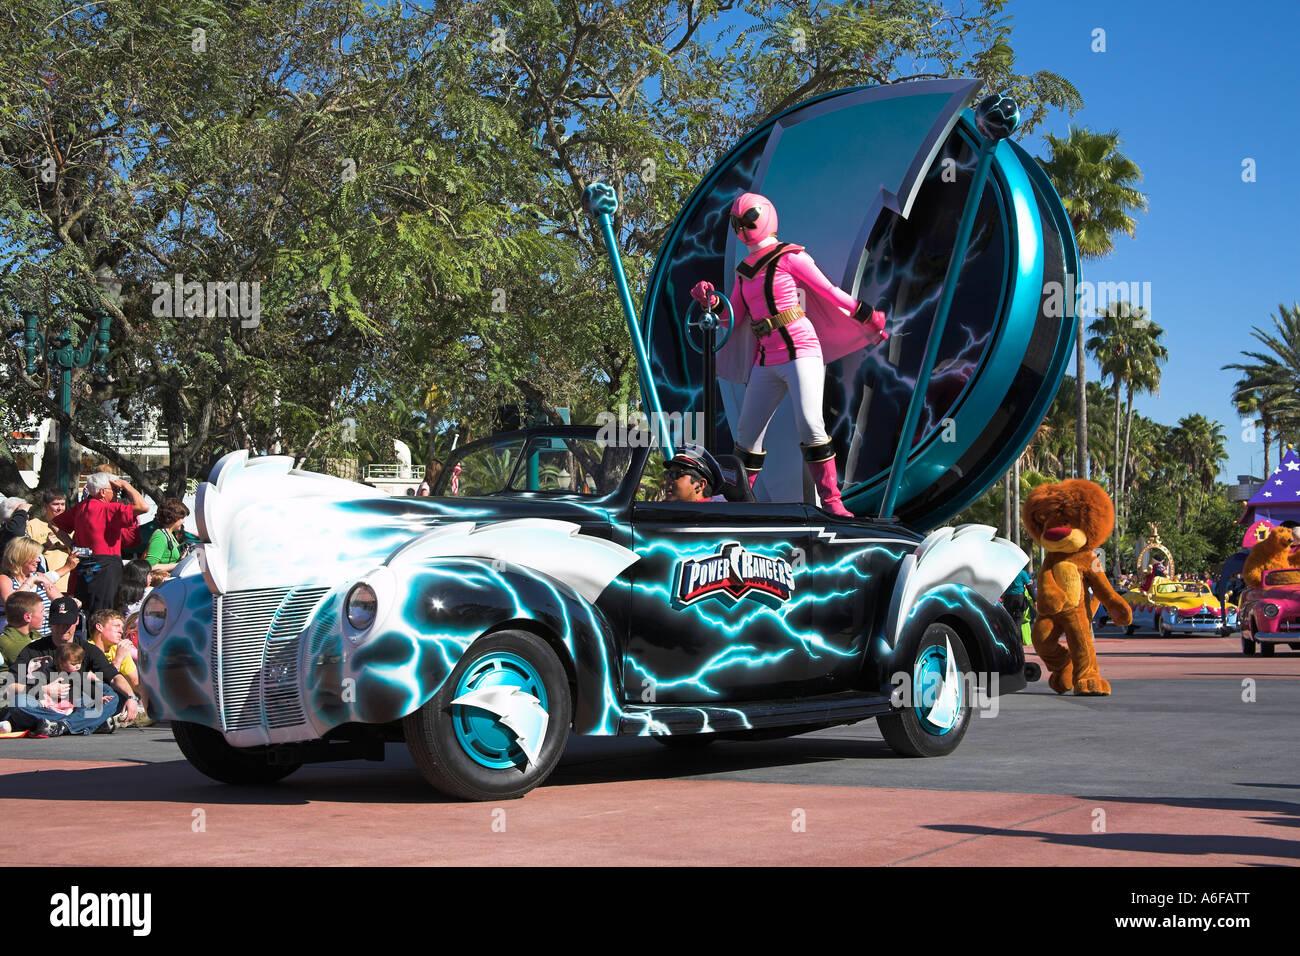 Power Rangers Disney Stars And Motor Cars Parade Disney